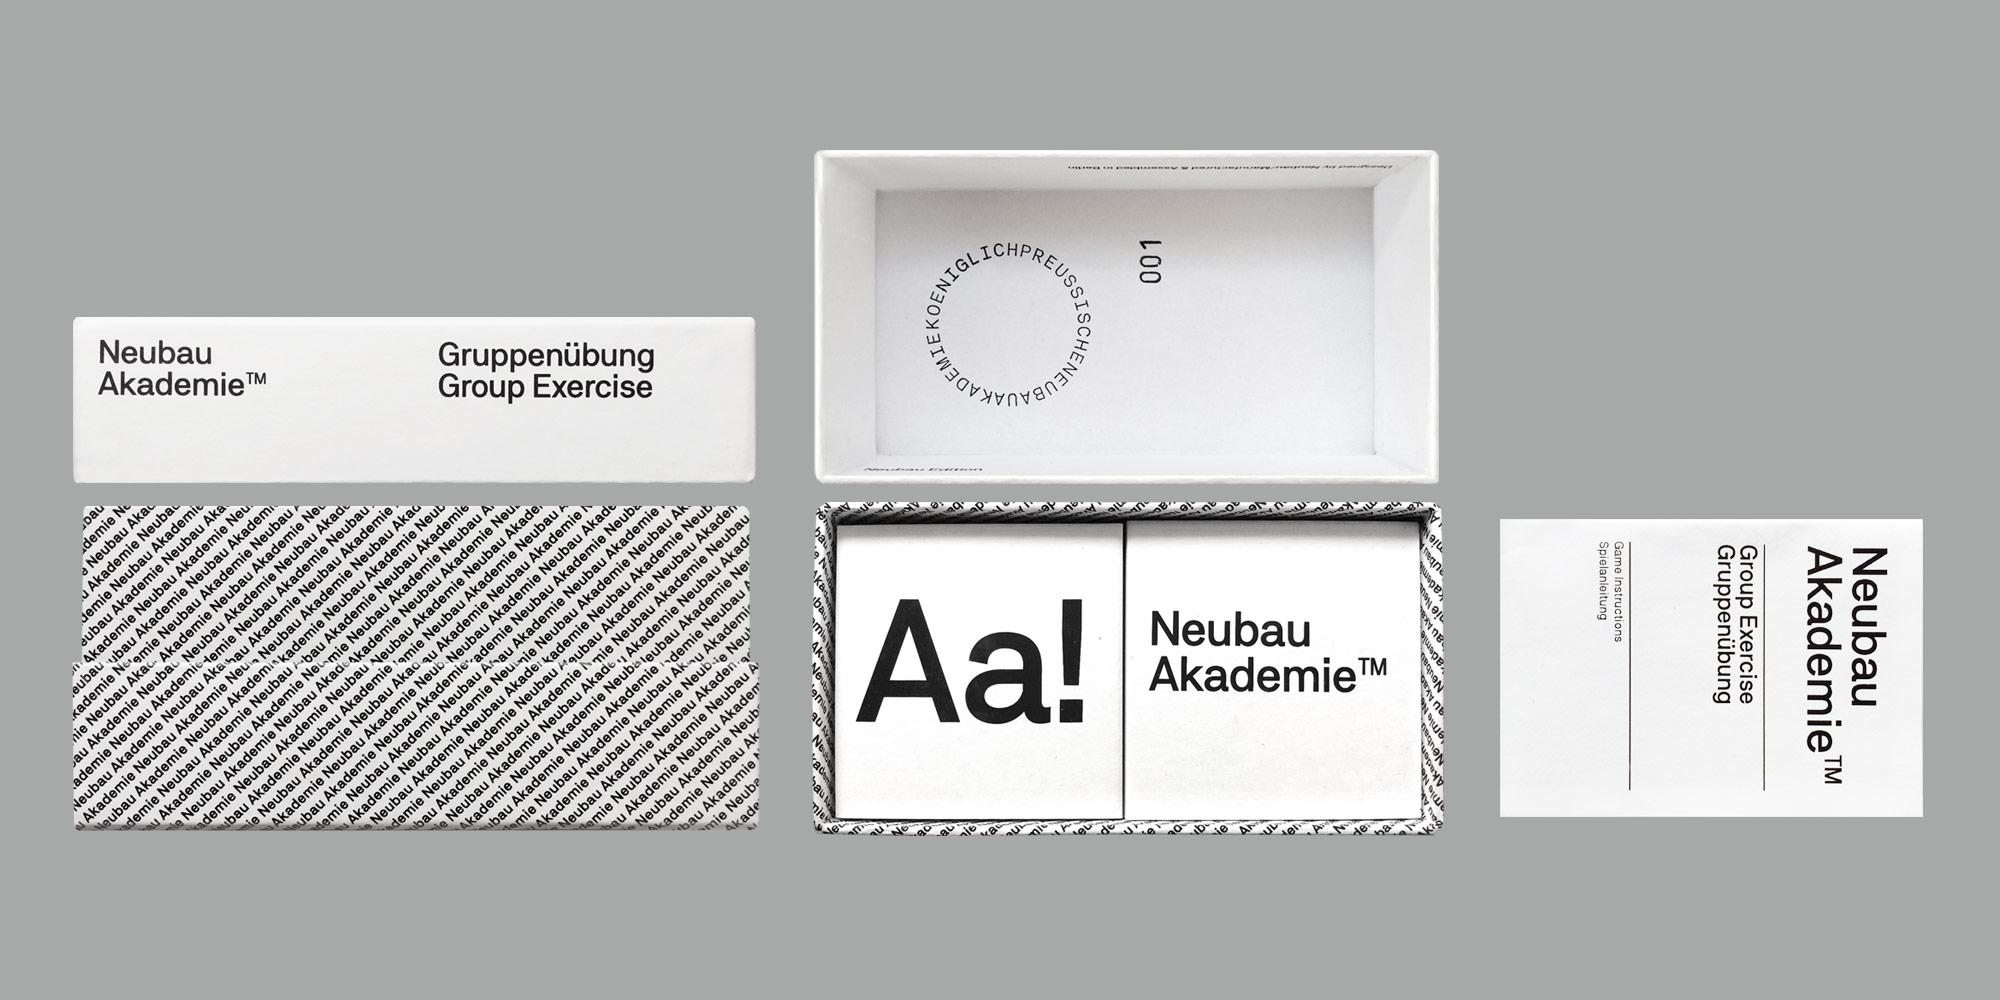 NBL_NB-AKA-GE-3